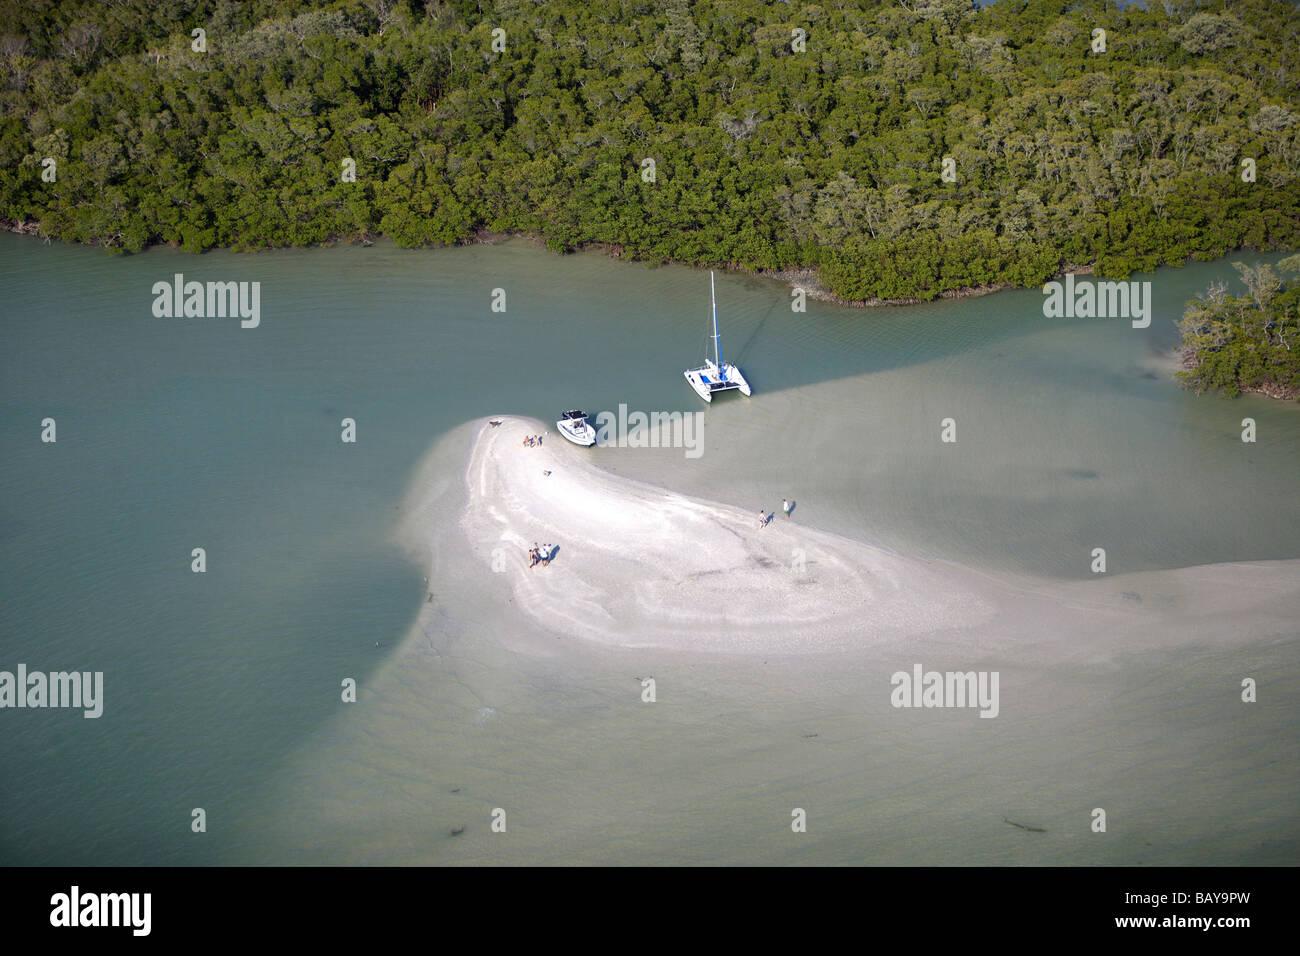 One island at Ten Thousand Islands National wildlife refuge, Florida, USA - Stock Image